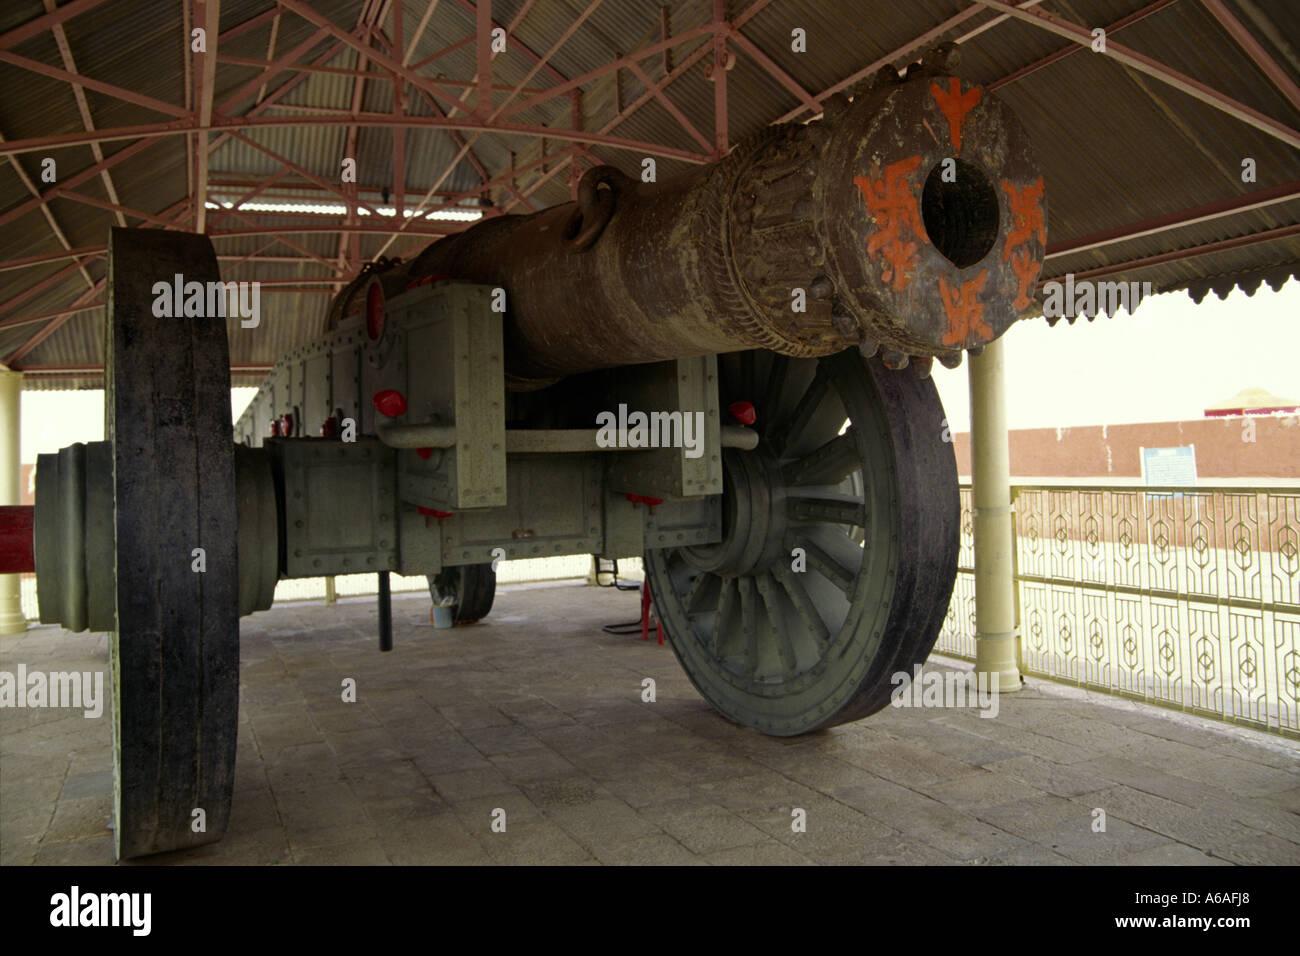 View of Jai Van, the world's largest cannon on wheels, Jaigarh near Jaipur Rajasthan India - Stock Image